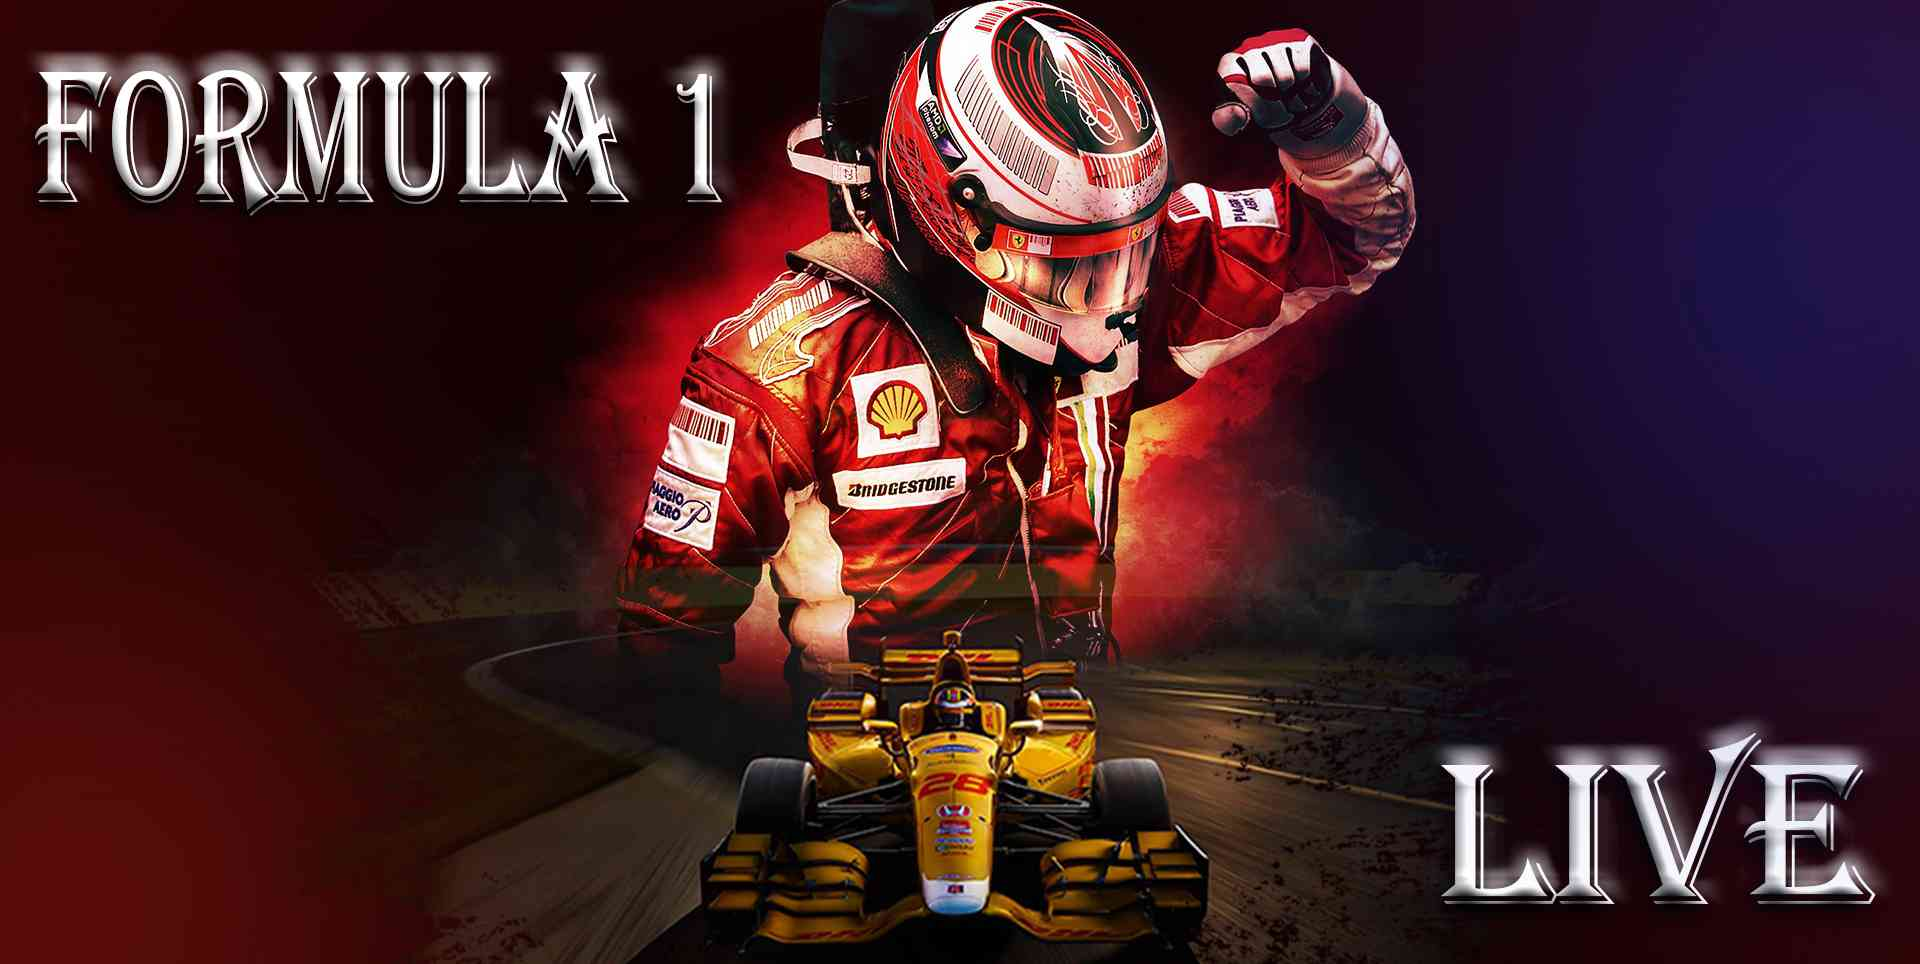 live-2016-hungarian-formula-1-grand-prix--online